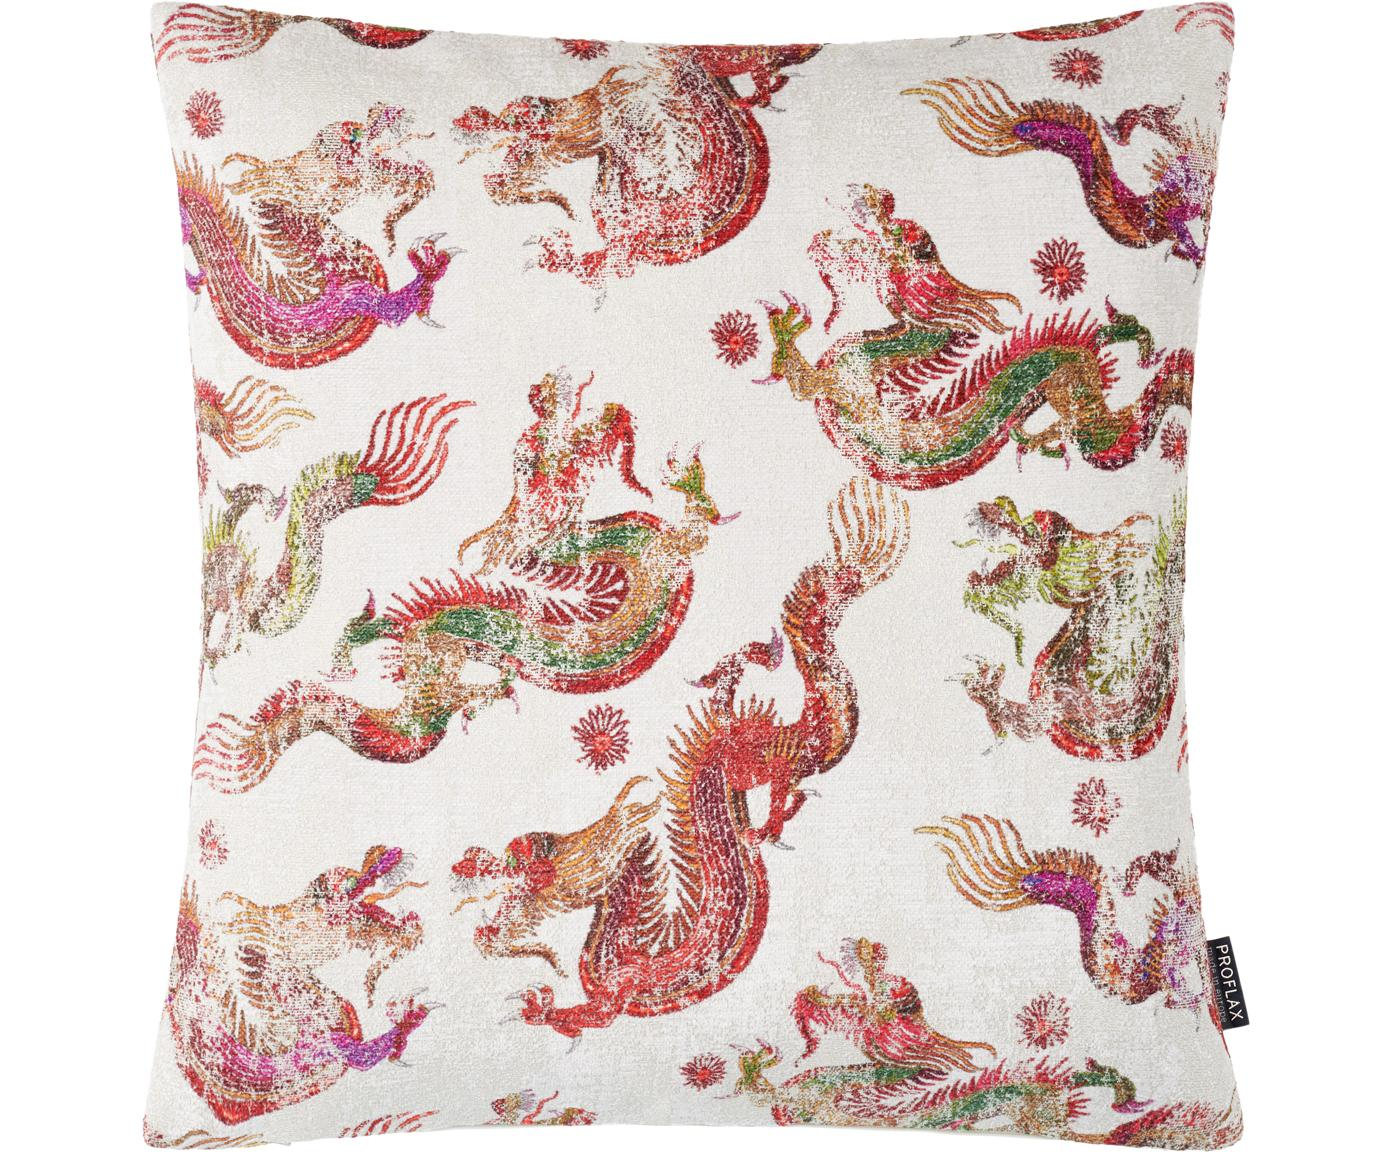 Kissenhülle Dragon mit Drachenmotiv, 57% Viskose, 43% Polyester, Weiß, Mehrfarbig, 45 x 45 cm